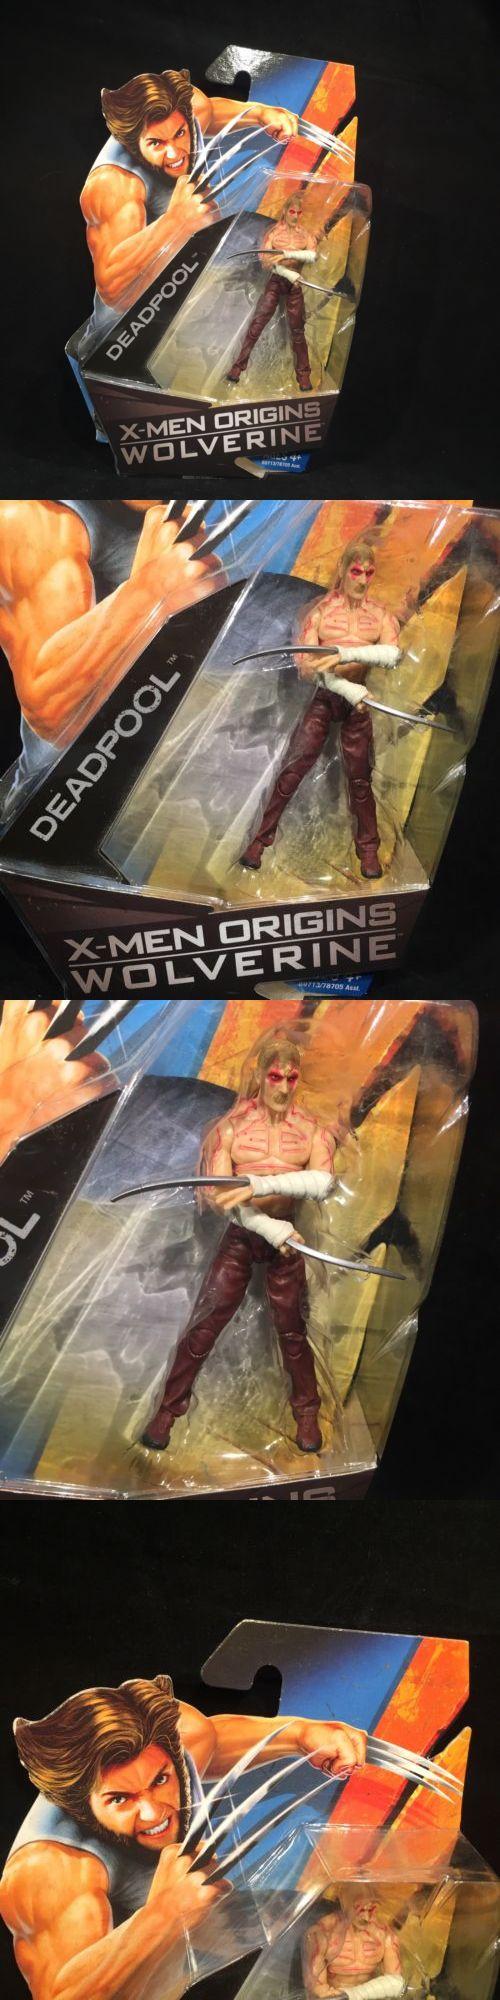 Action Figures 7114: Deadpool Unmasked Wolverine Origins Movie Marvel Universe 3.75 On Card X-Men -> BUY IT NOW ONLY: $44.99 on eBay!